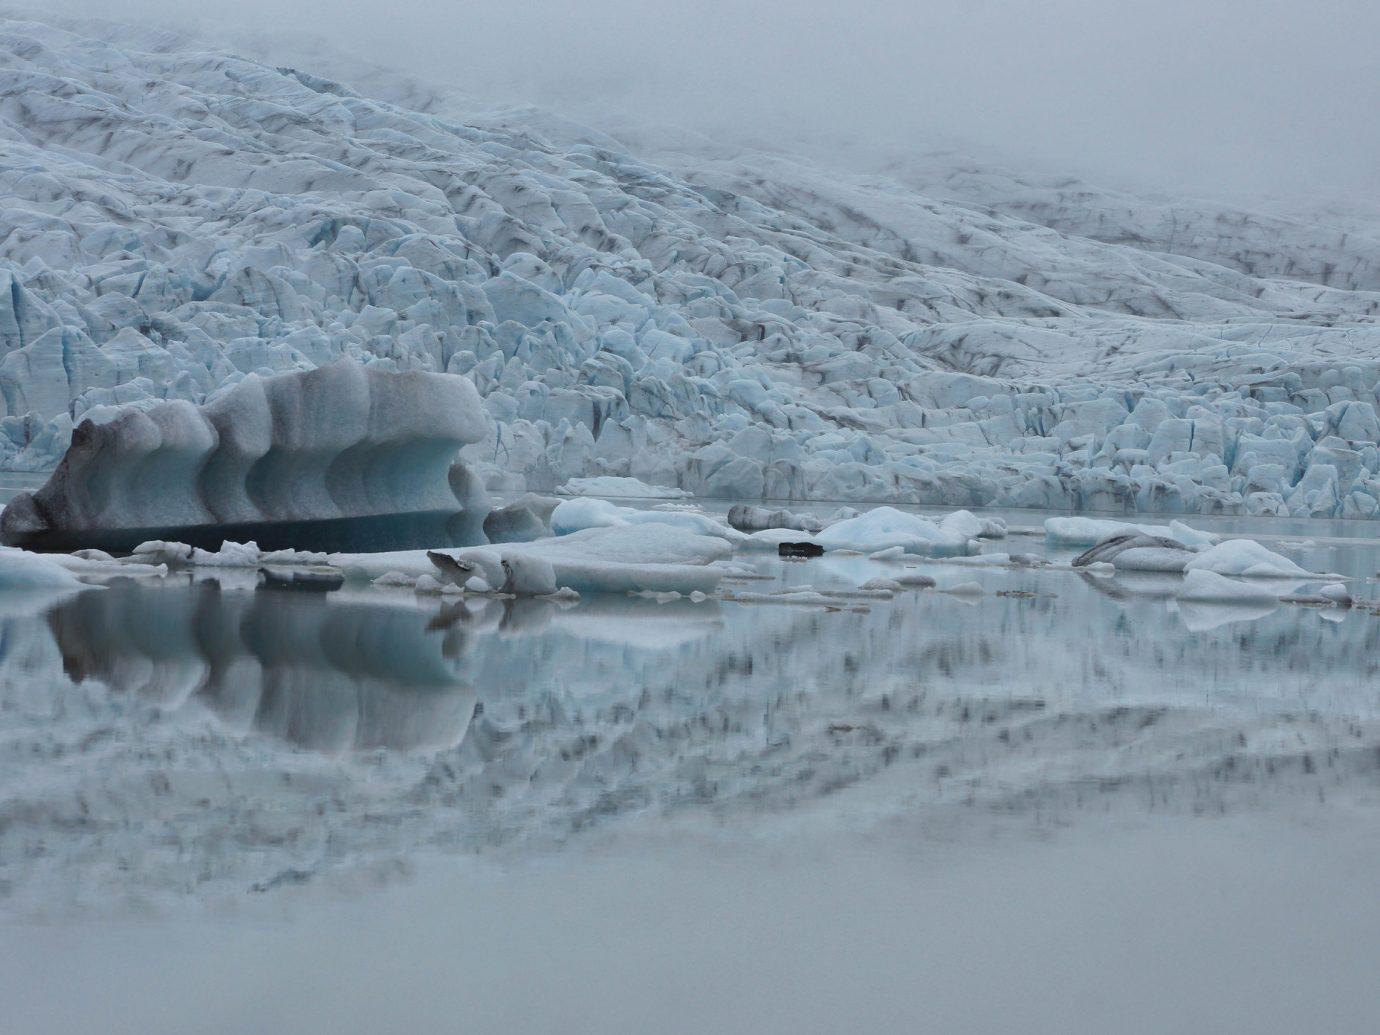 Editors Picks Luxury Travel Trip Ideas outdoor snow Nature ice arctic freezing glacial landform Winter arctic ocean ice cap polar ice cap glacier sea ice iceberg sky mountain landscape